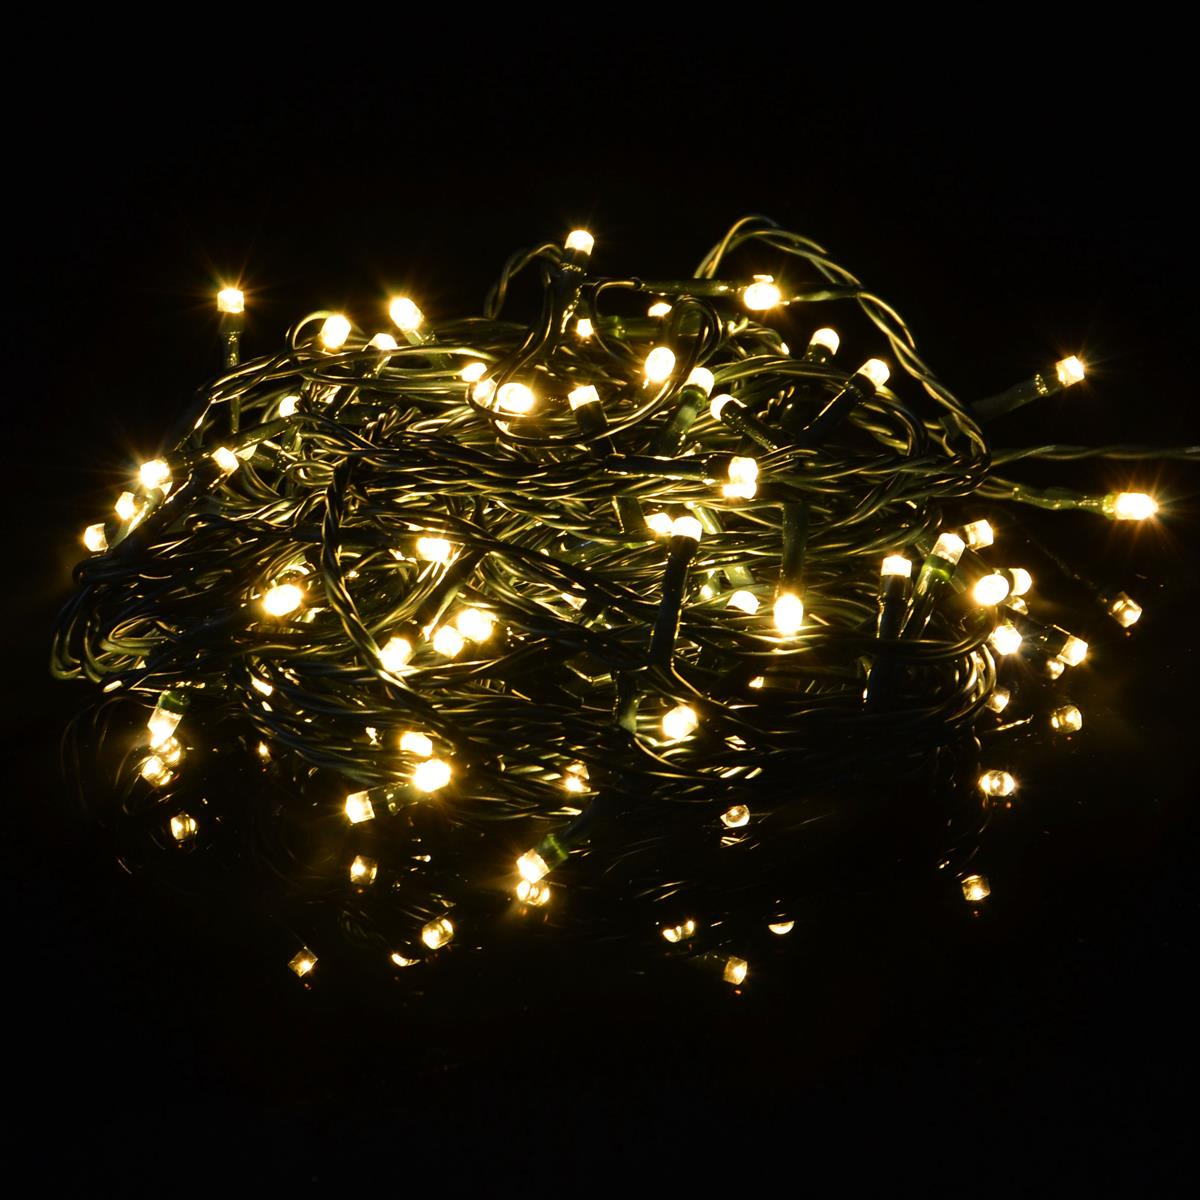 Weihnachtsbeleuchtung Lichterketten Led.35er Led Lichterkette Warm Weiß Partybeleuchtung